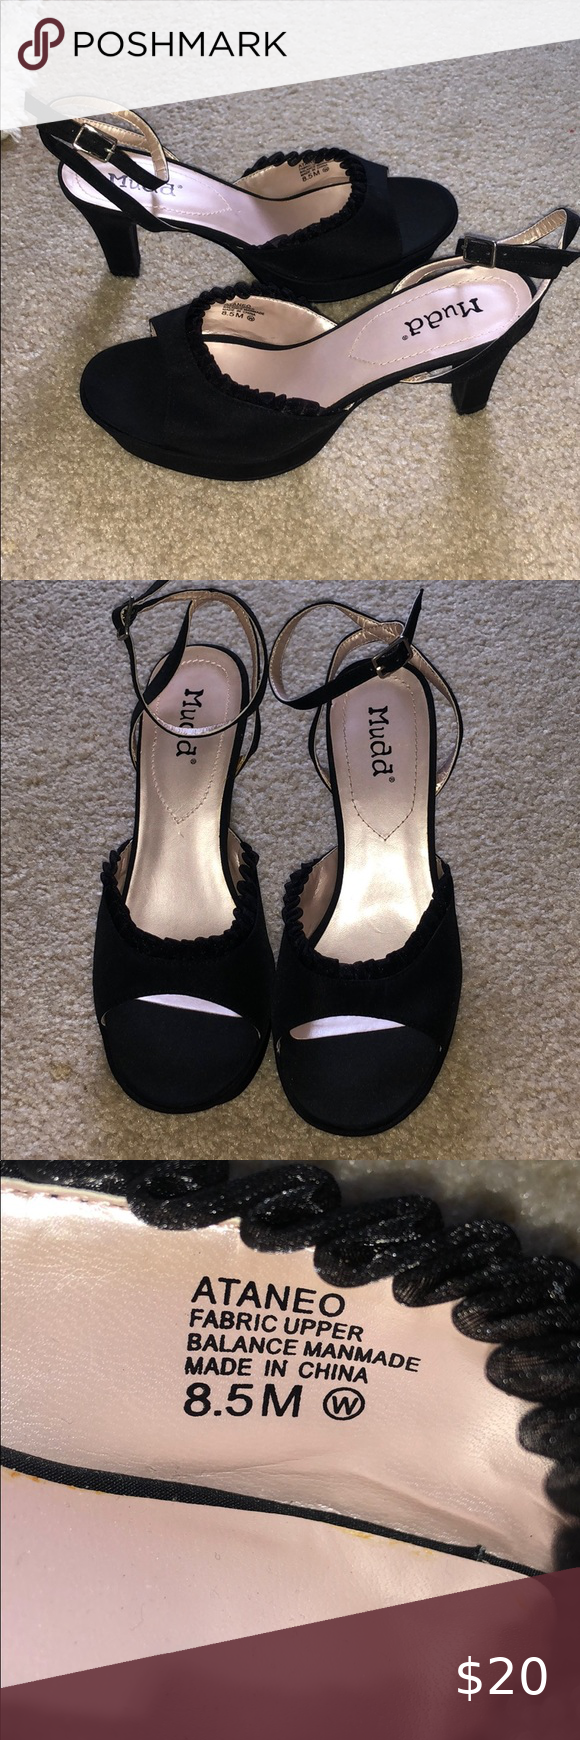 Mudd open toe heels